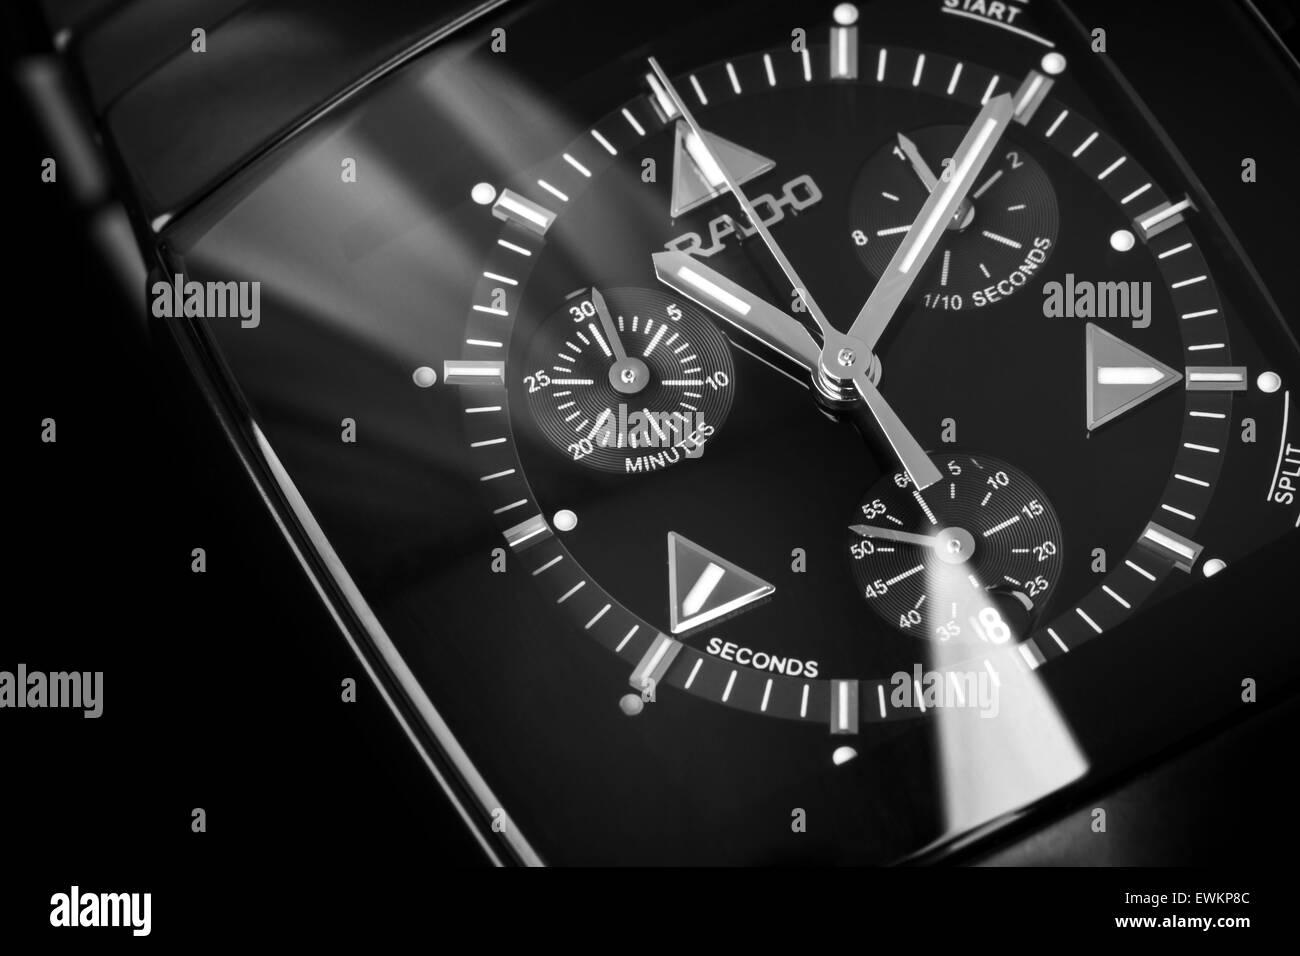 Saint-Petersburg, Russia - June 18, 2015: Rado Sintra Chrono, Mens Chronograph Watch made of black high-tech ceramics - Stock Image